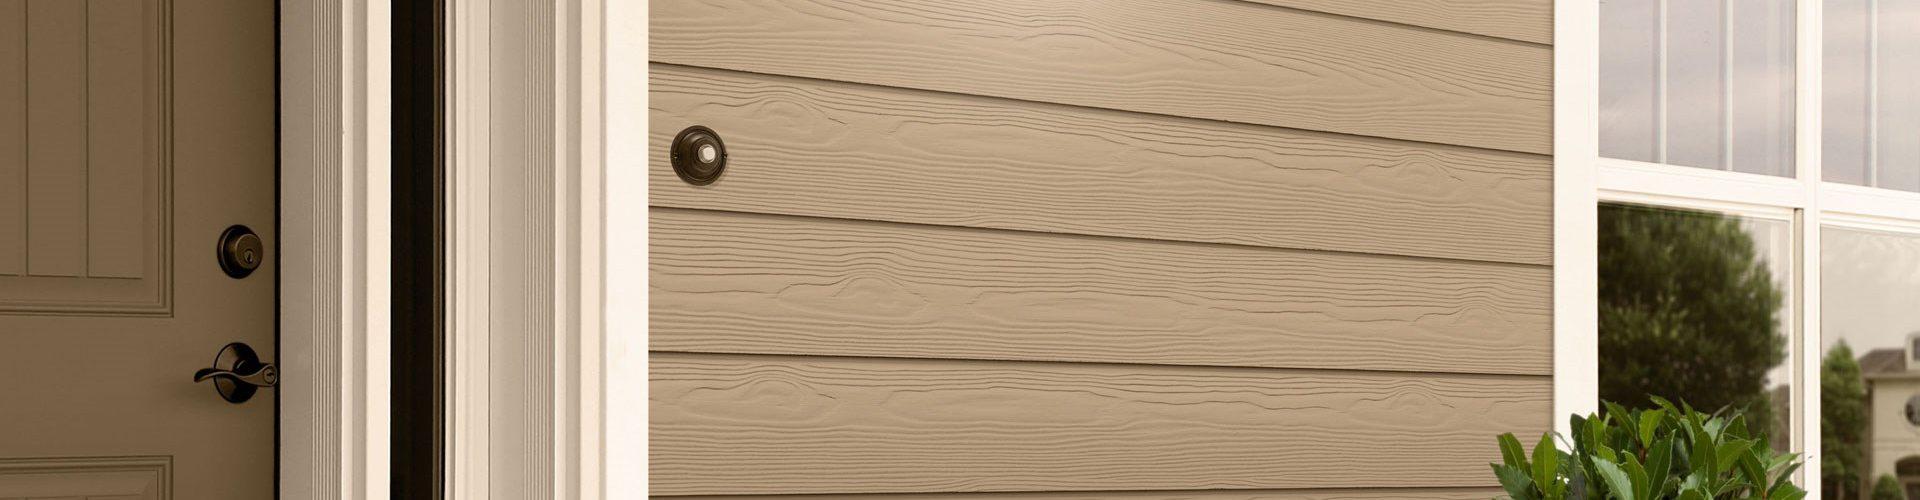 Cedral Classic C11 Maakollane - ülekattega puidumustriga voodrilaud